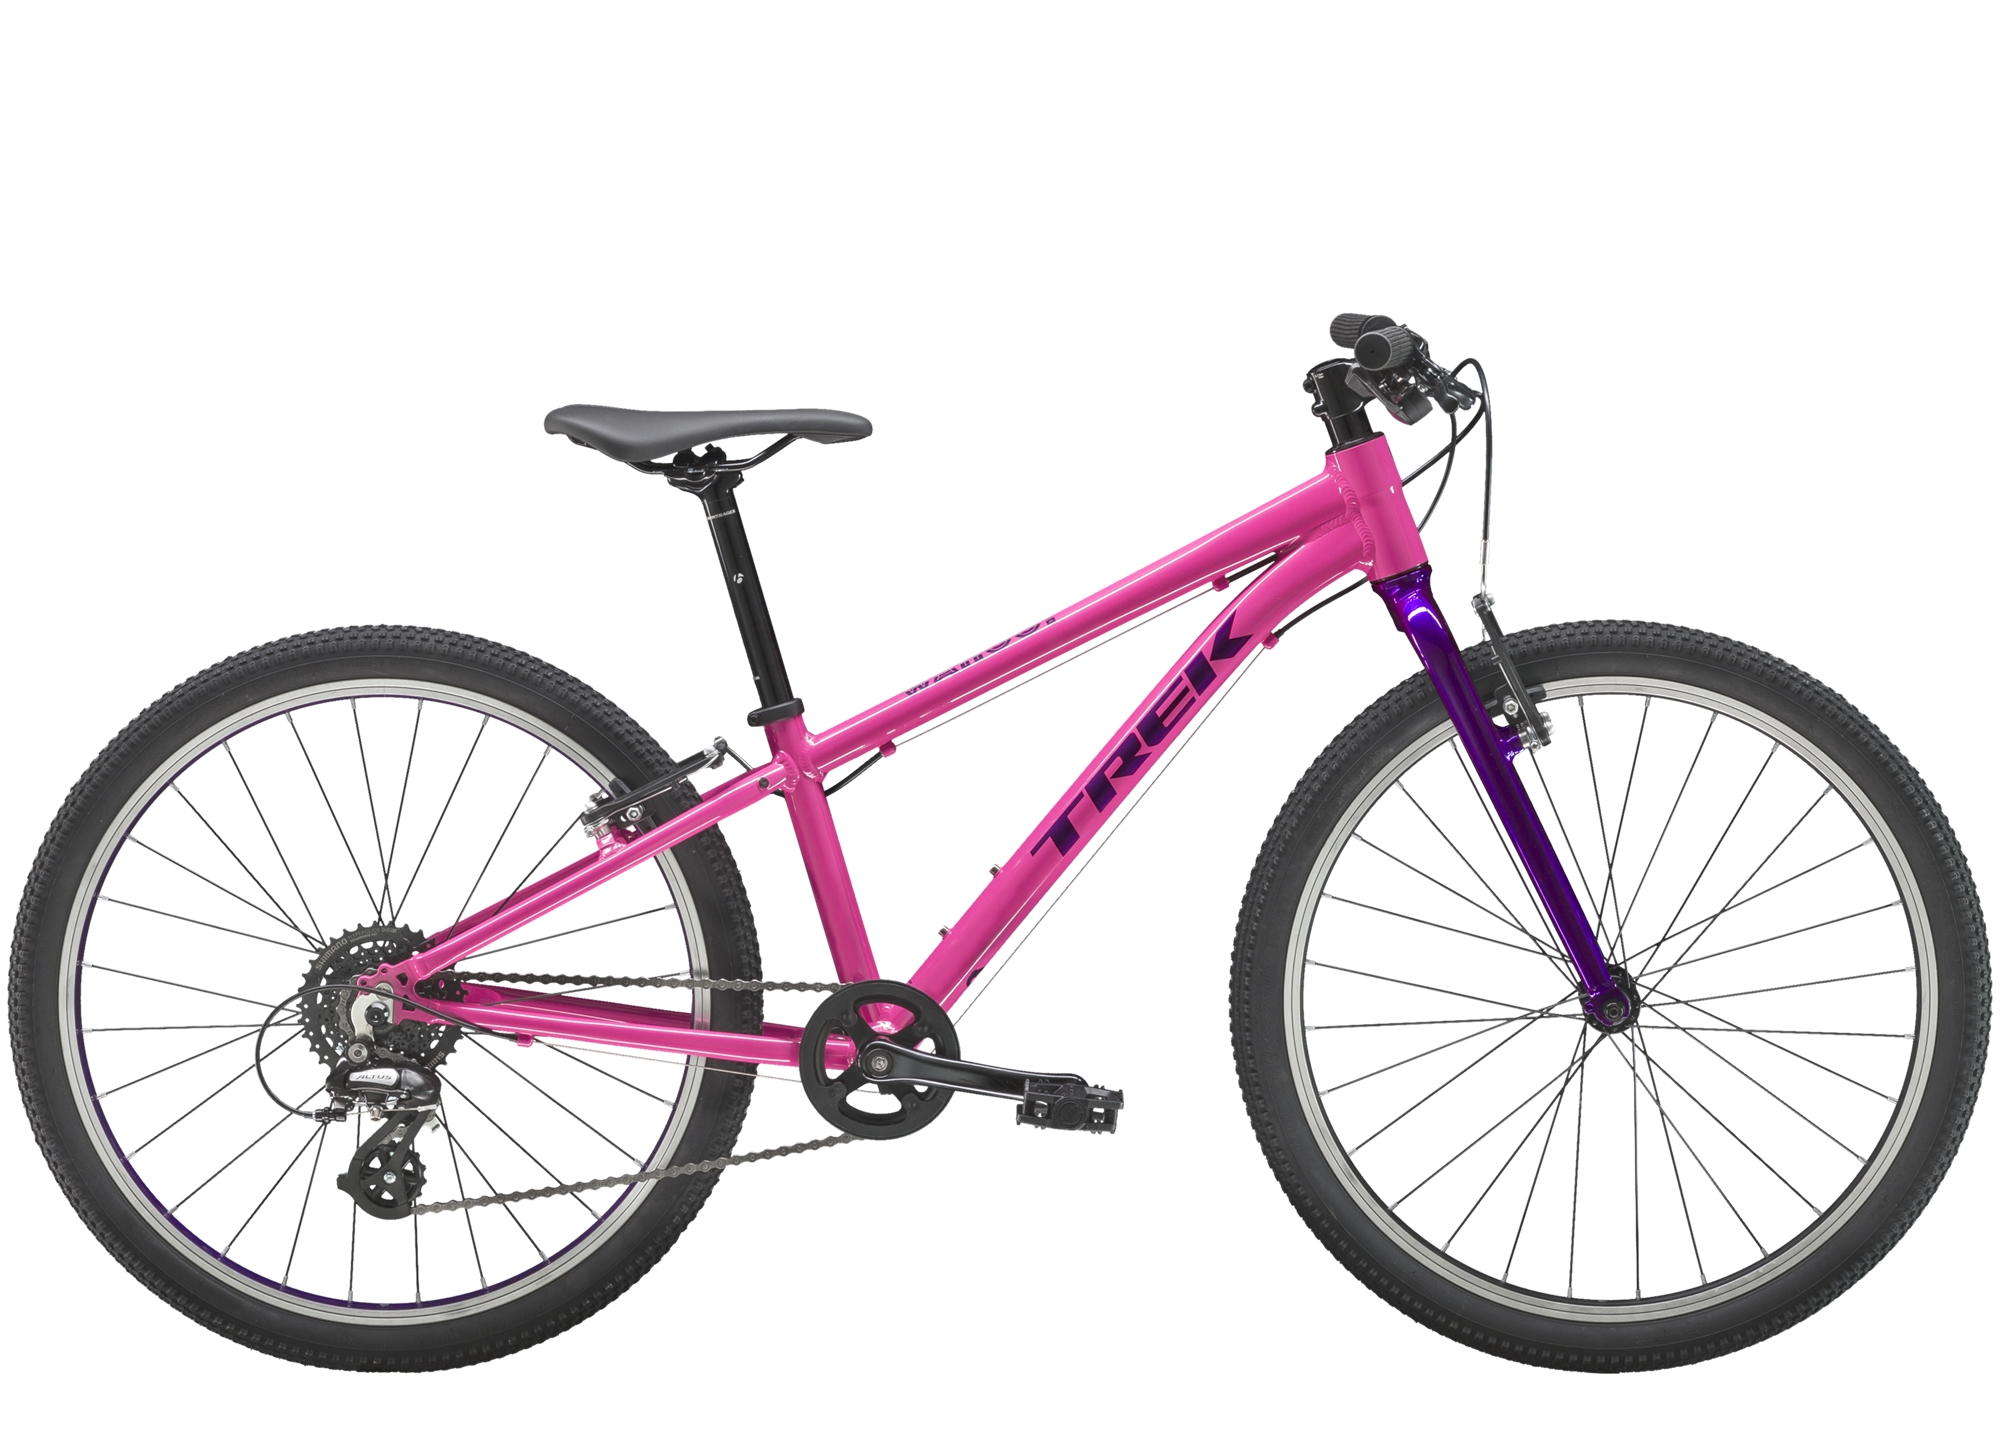 9e902e4c9a4 ... Blk 19 Trek Wahoo Mountain Bike: Trek Wahoo 24 2019